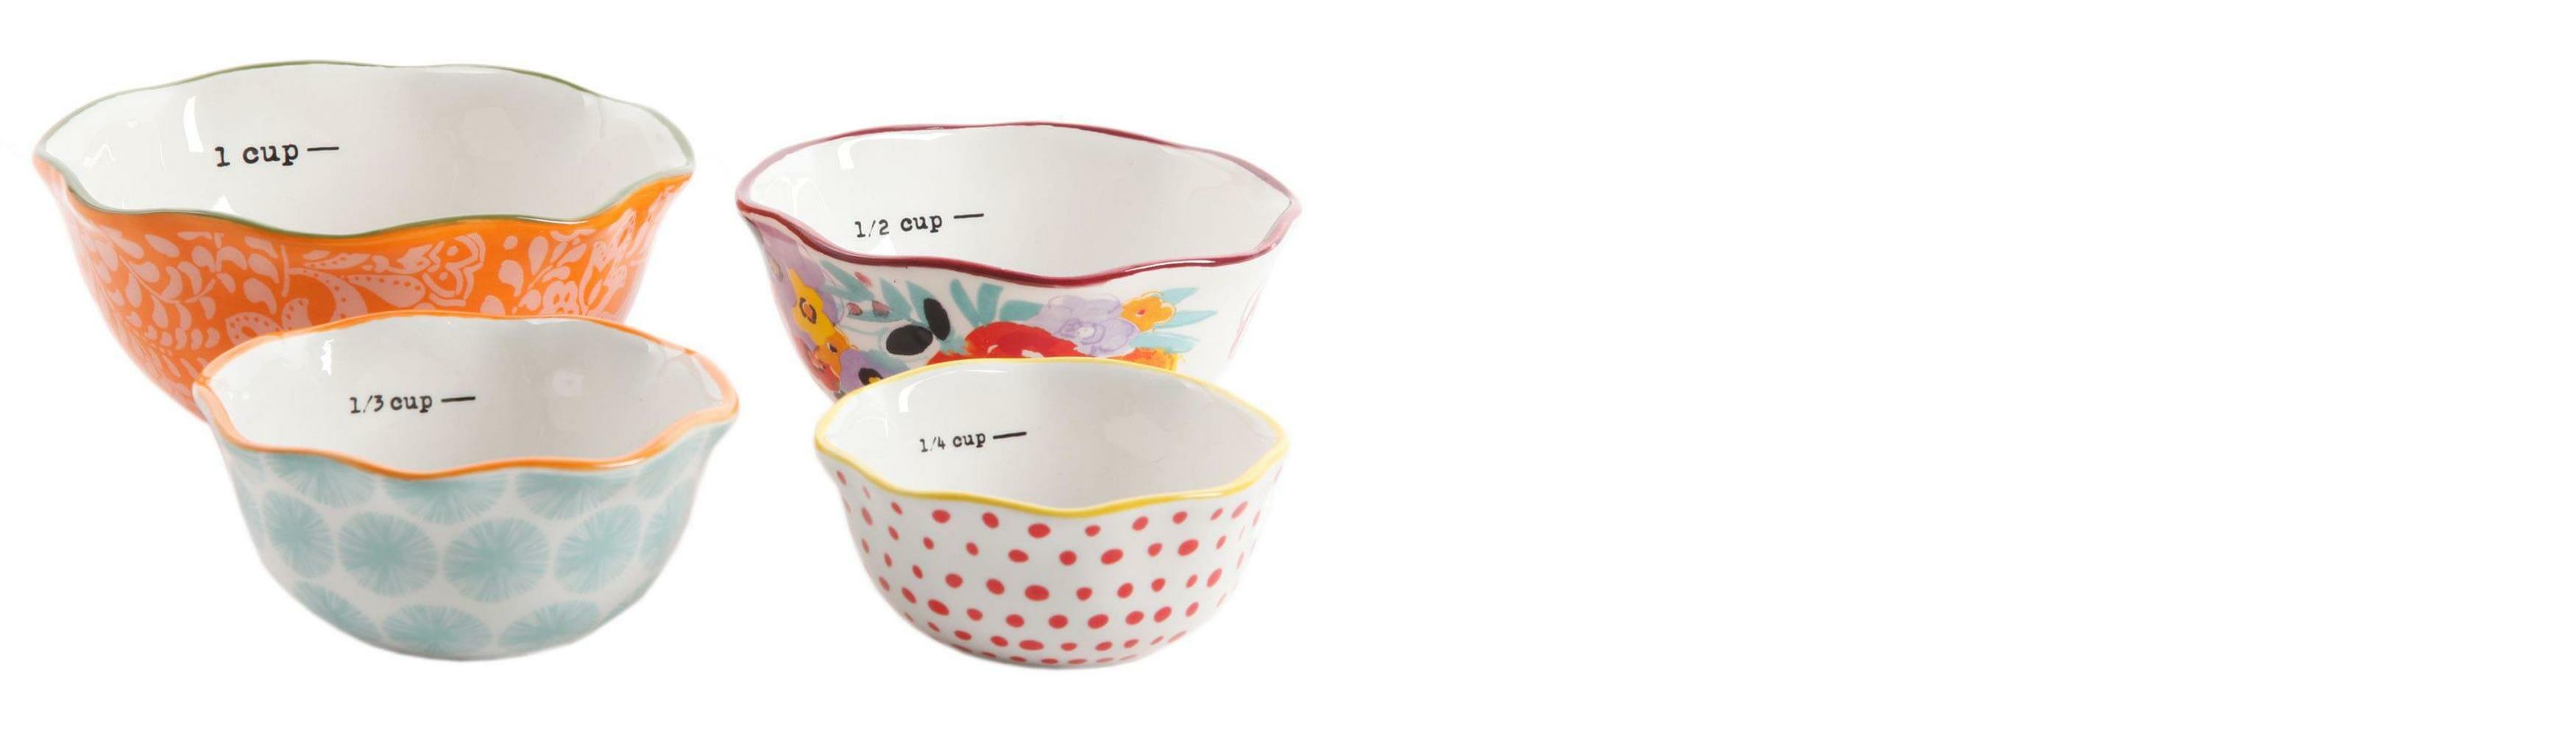 measuring-bowls